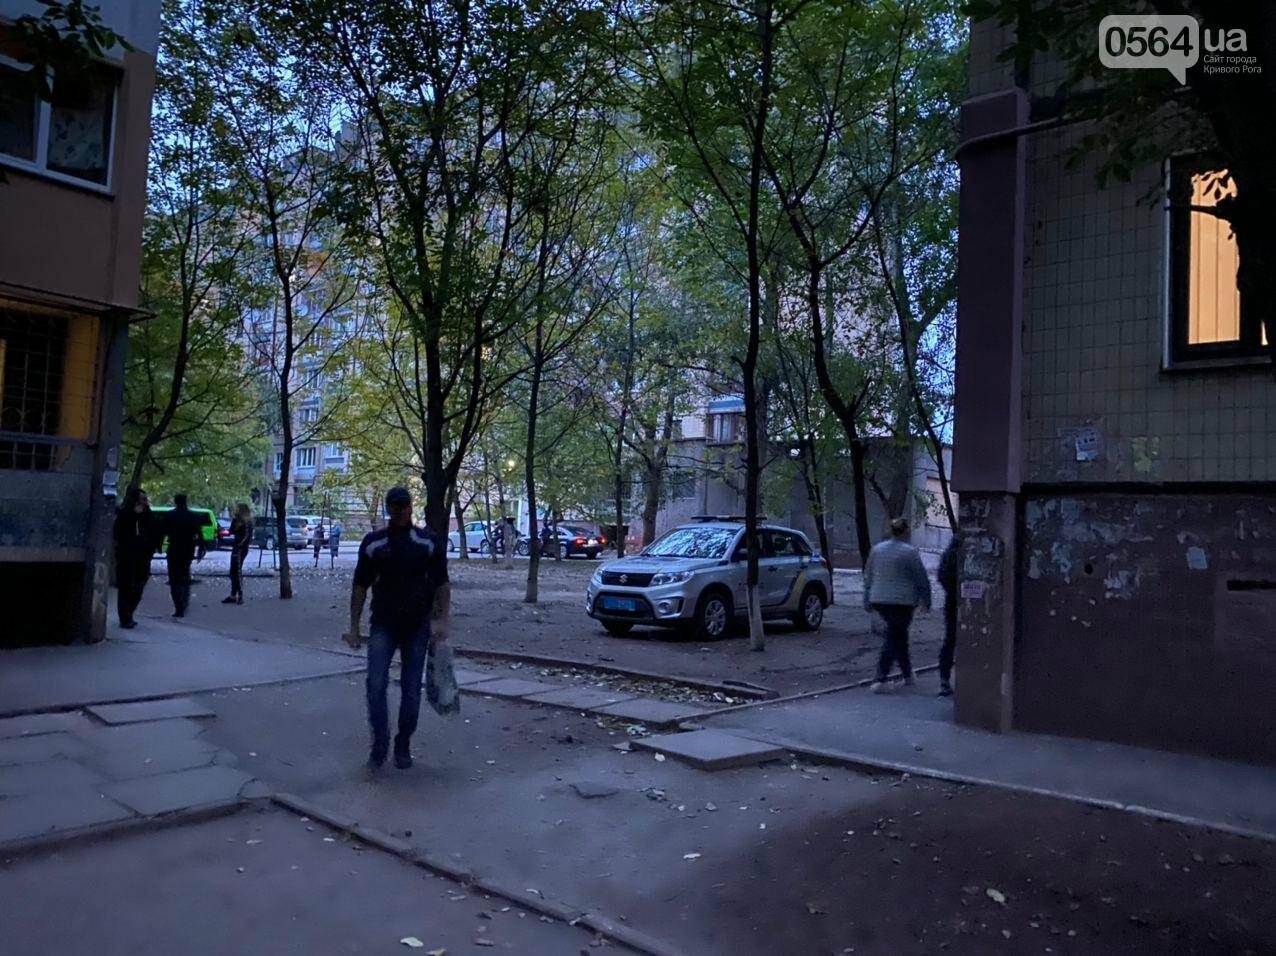 В Кривом Роге погиб мужчина, упавший с 5 этажа жилого дома, - ФОТО 18+, фото-4